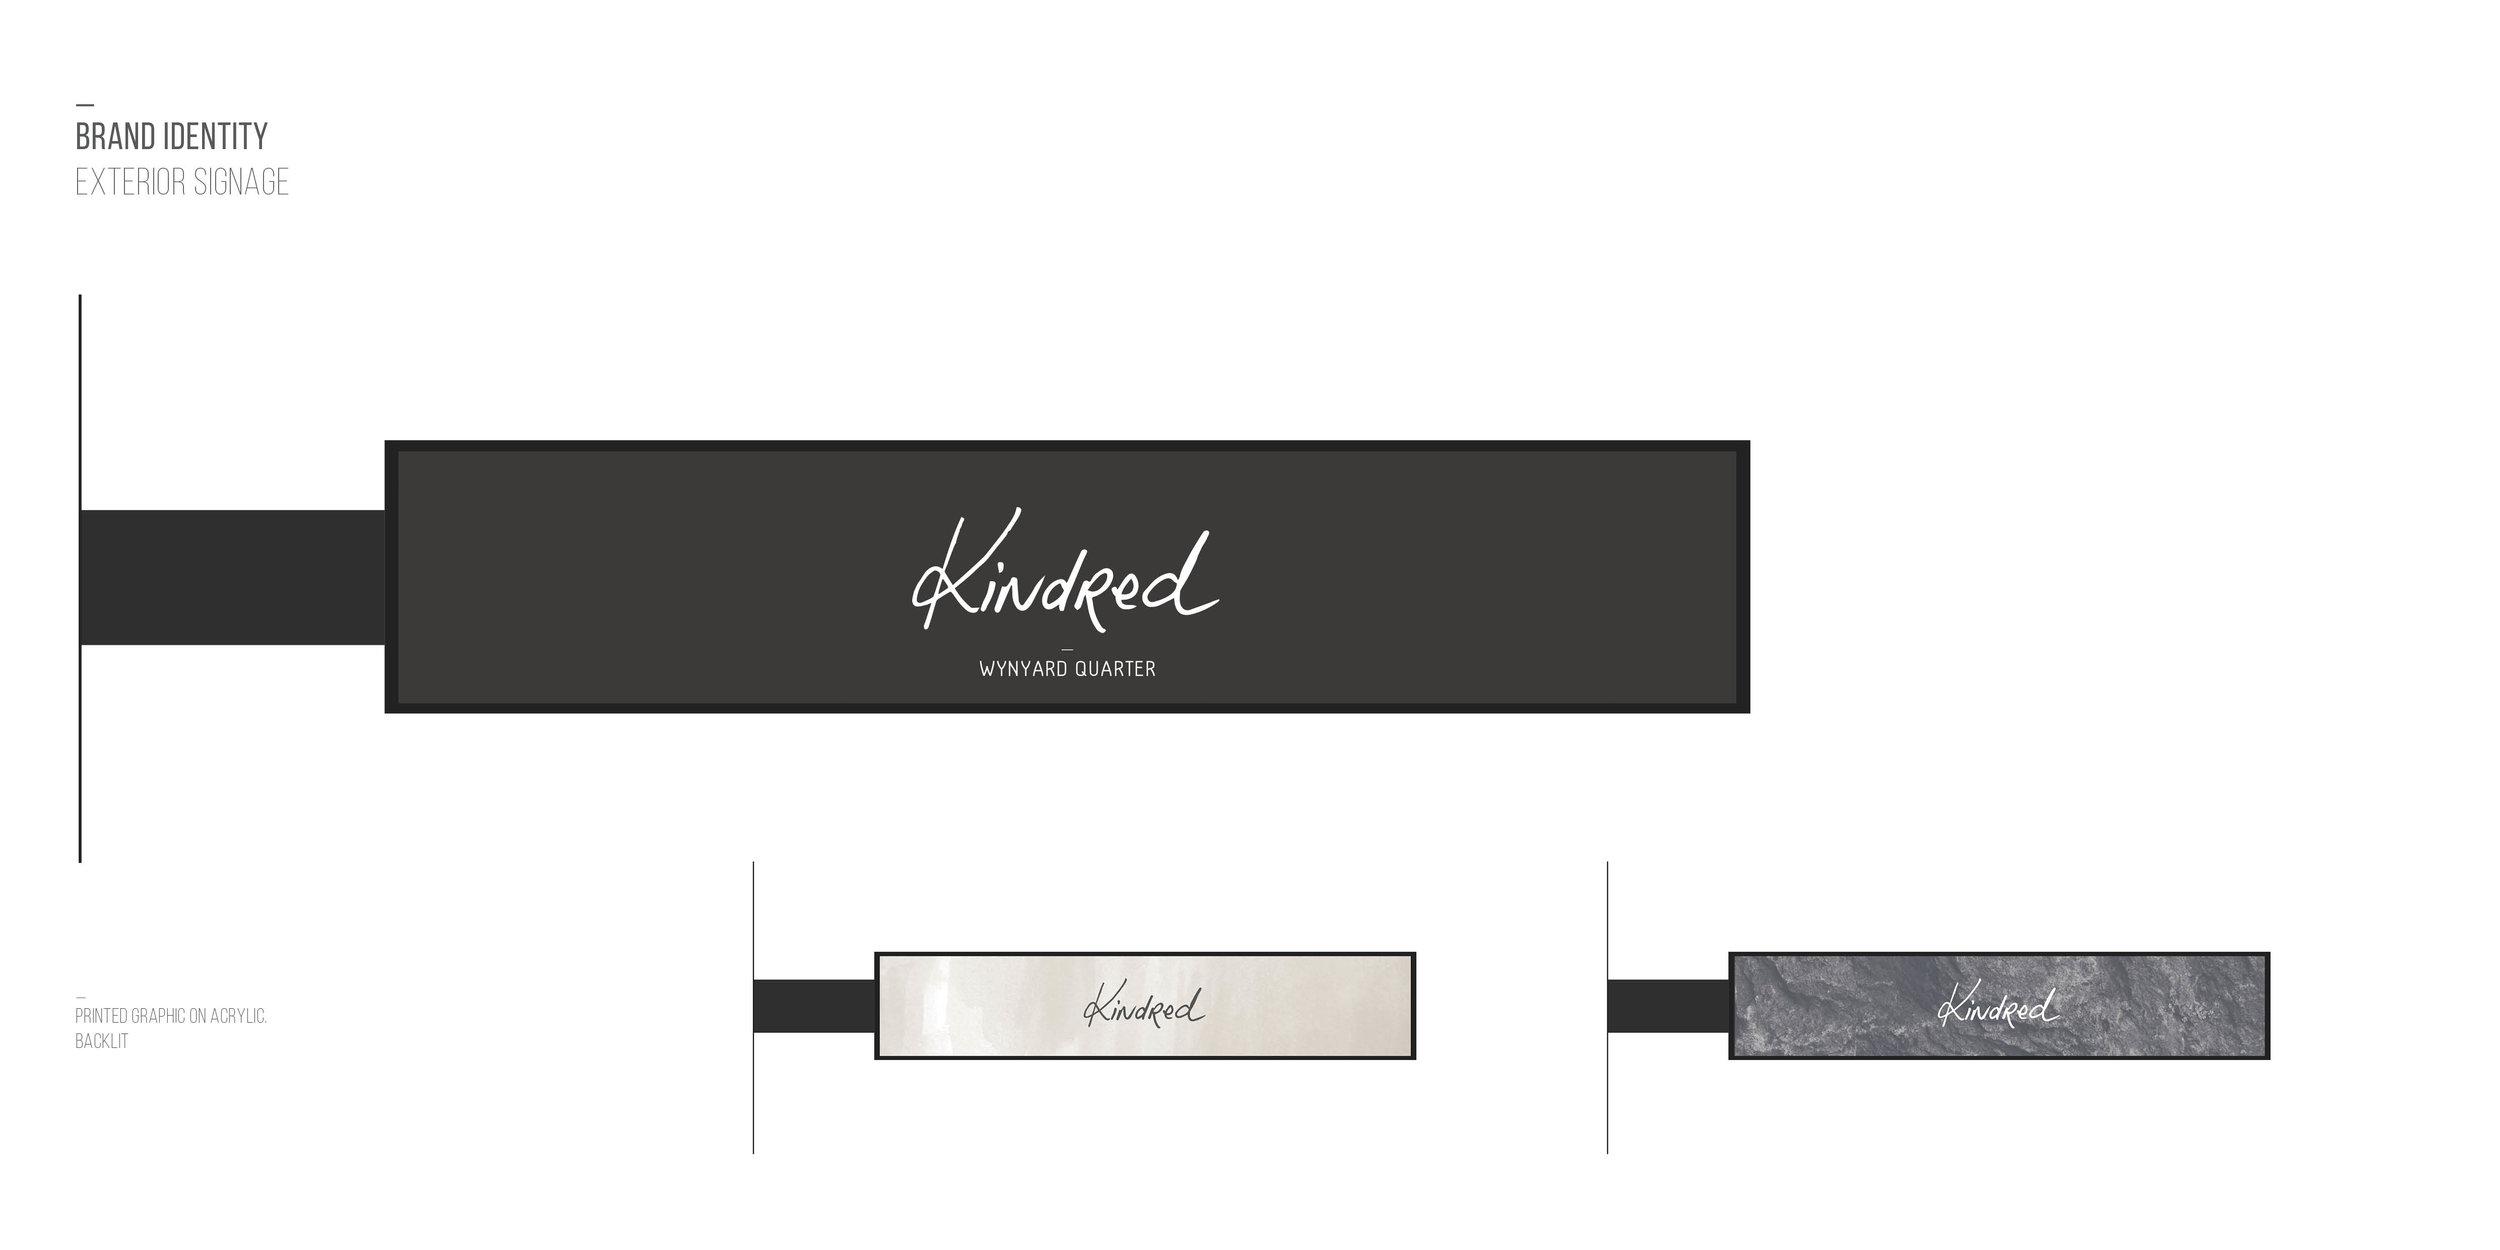 Kindred_Brand_Identity11.jpg